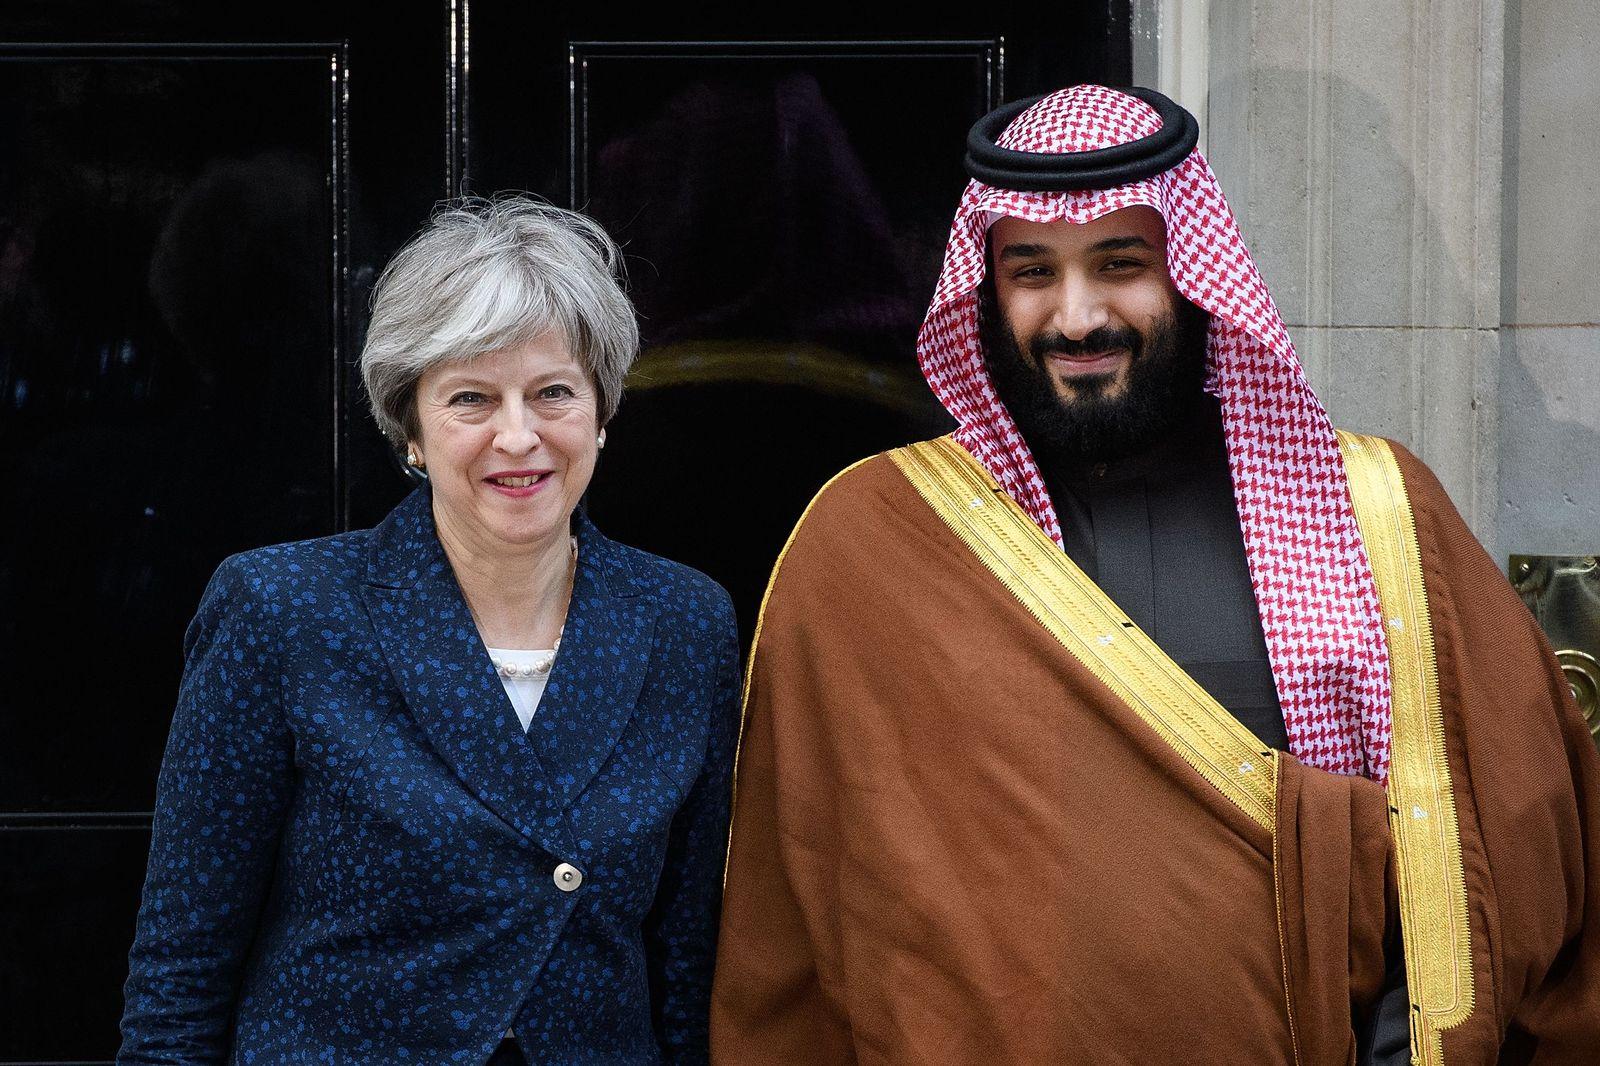 Theresa May / Mohammed bin Salman